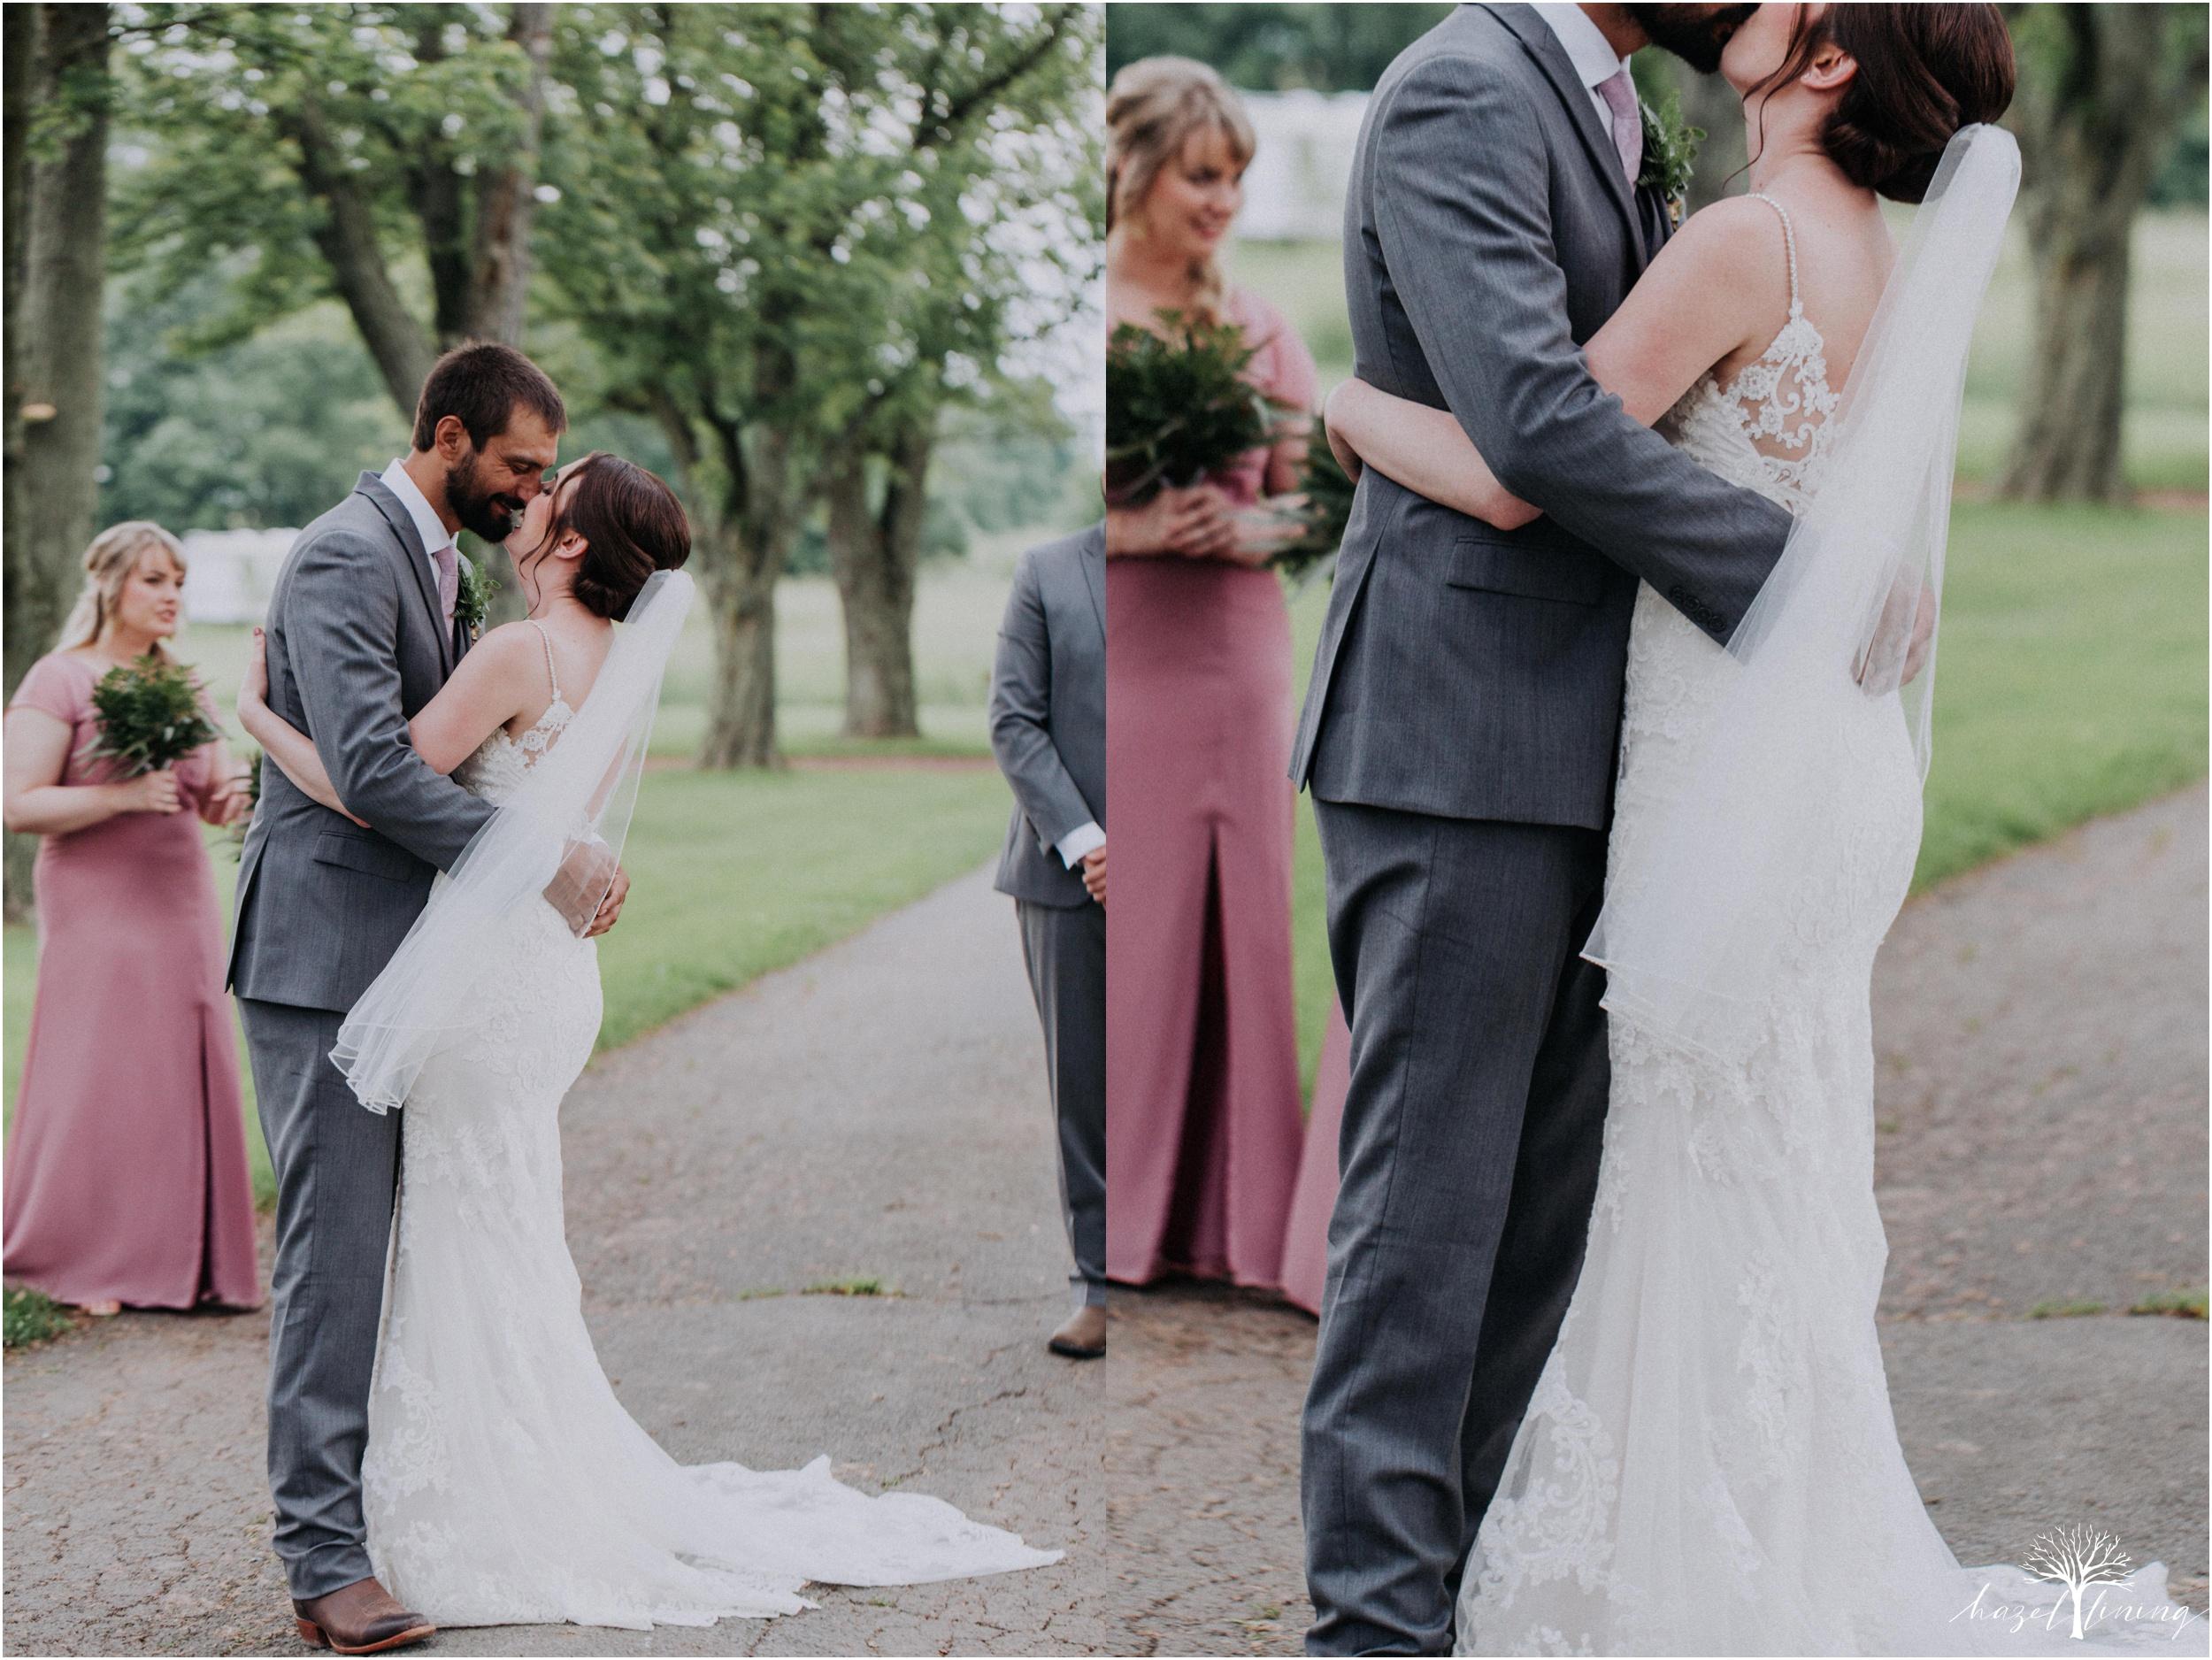 hazel-lining-travel-wedding-elopement-photography-lisa-landon-shoemaker-the-farm-bakery-and-events-bucks-county-quakertown-pennsylvania-summer-country-outdoor-farm-wedding_0074.jpg